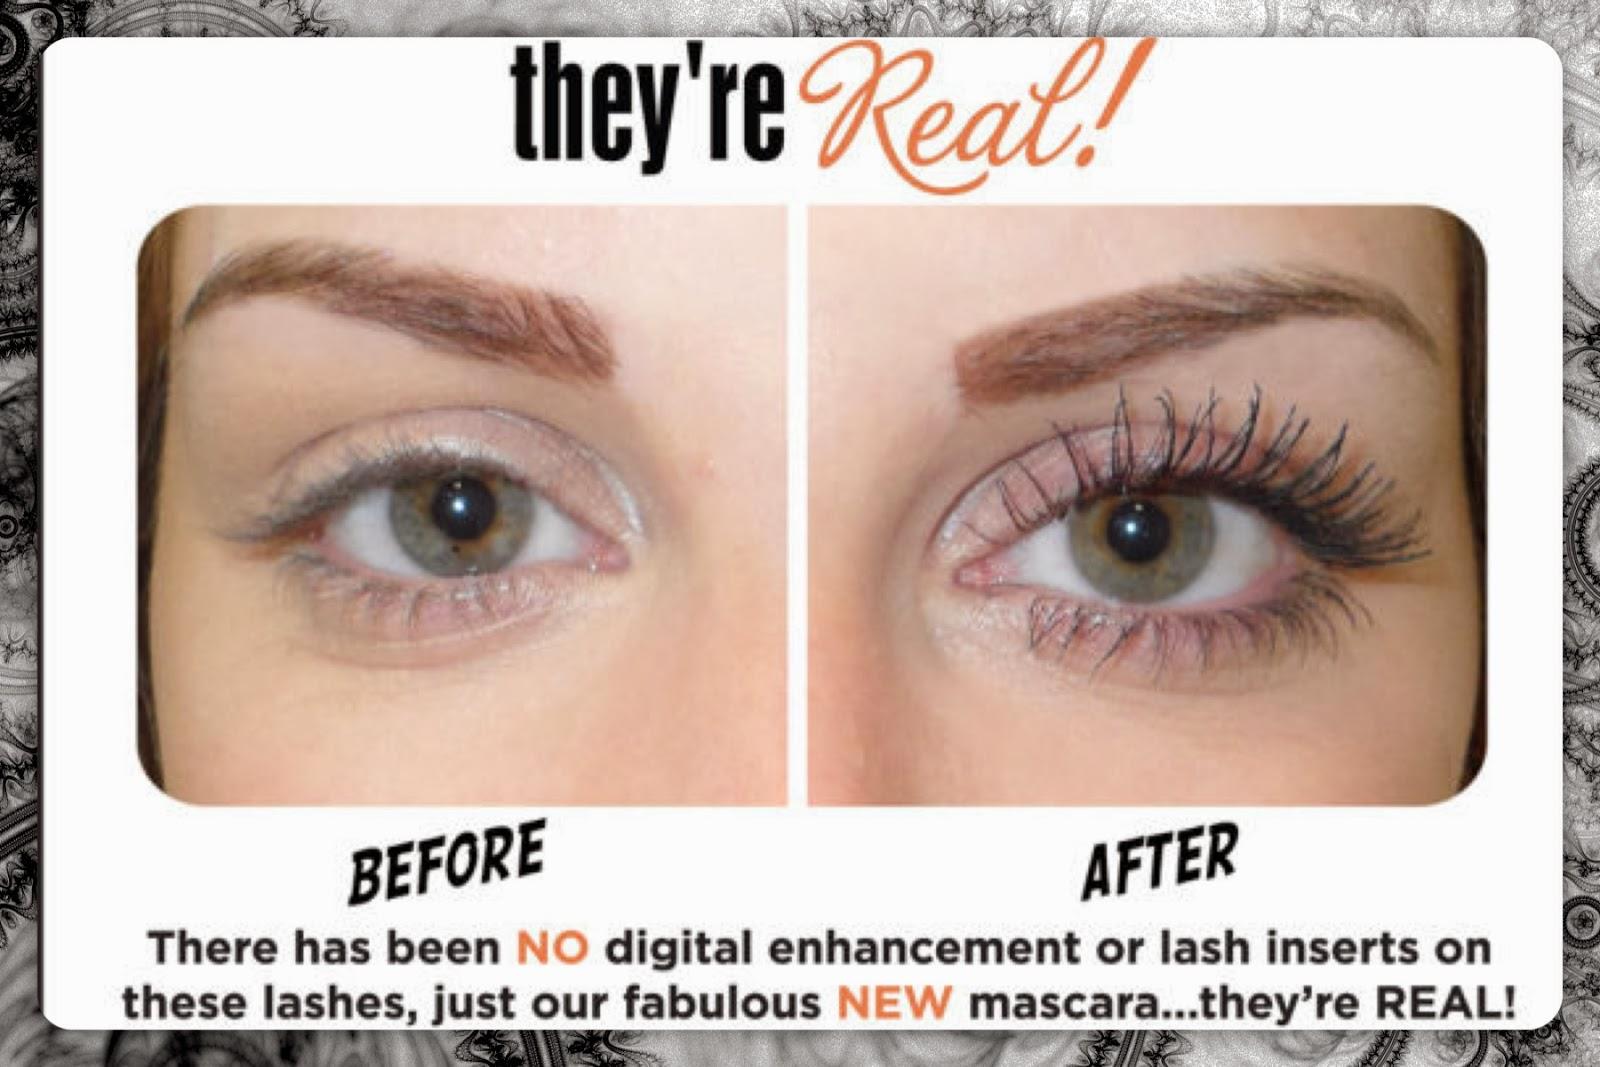 Benefit They Re Real Mascara Dupe Photo Album - Mezza